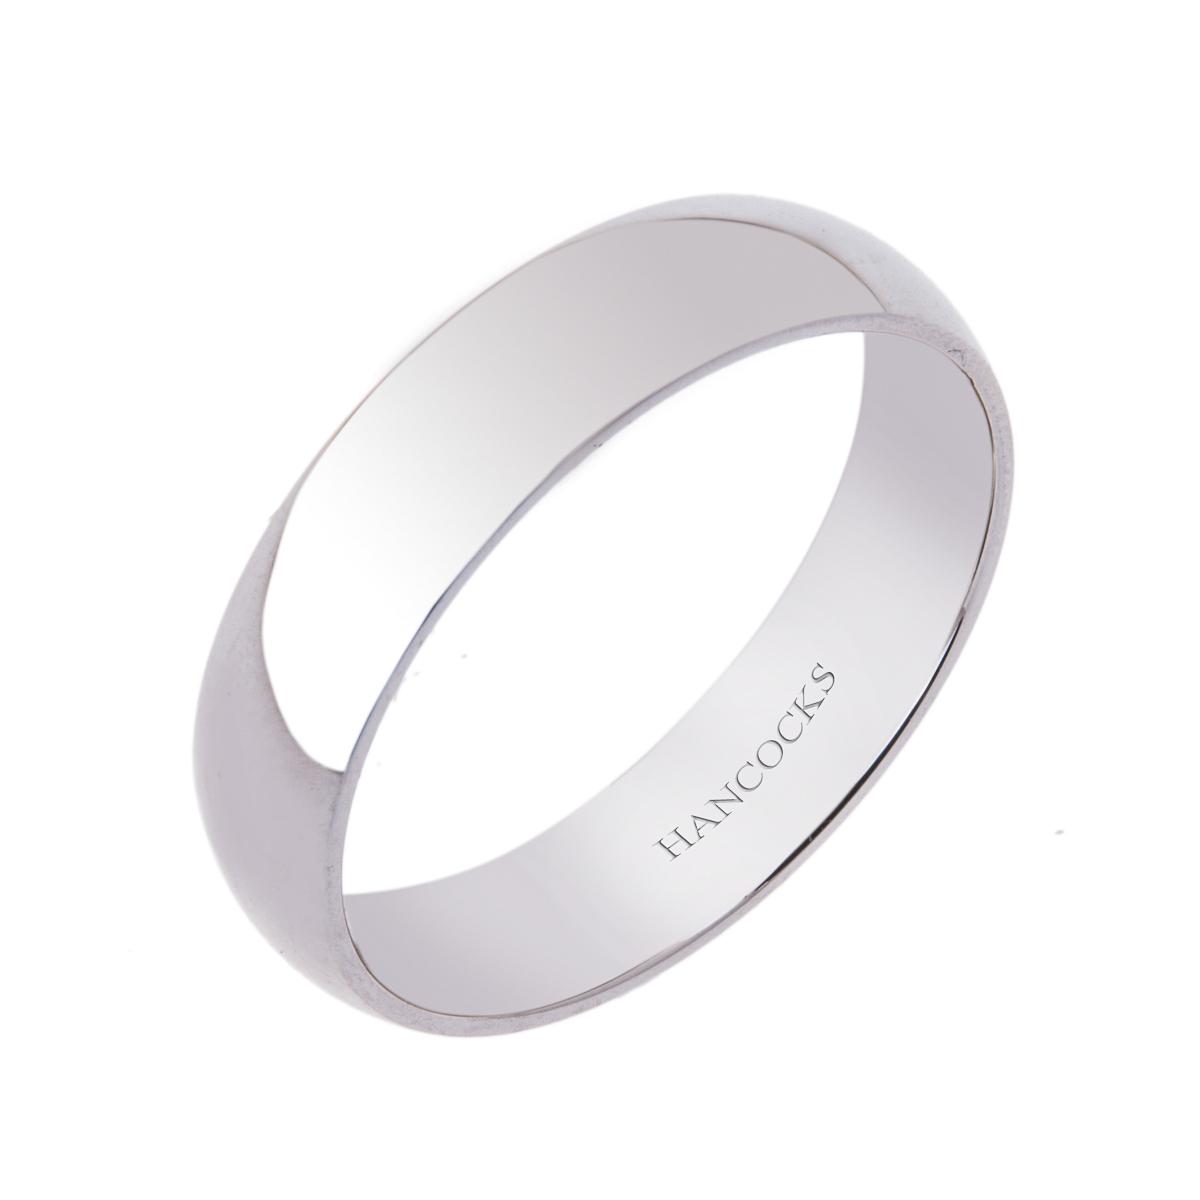 5mm-gents-polished-platinum-wedding-band